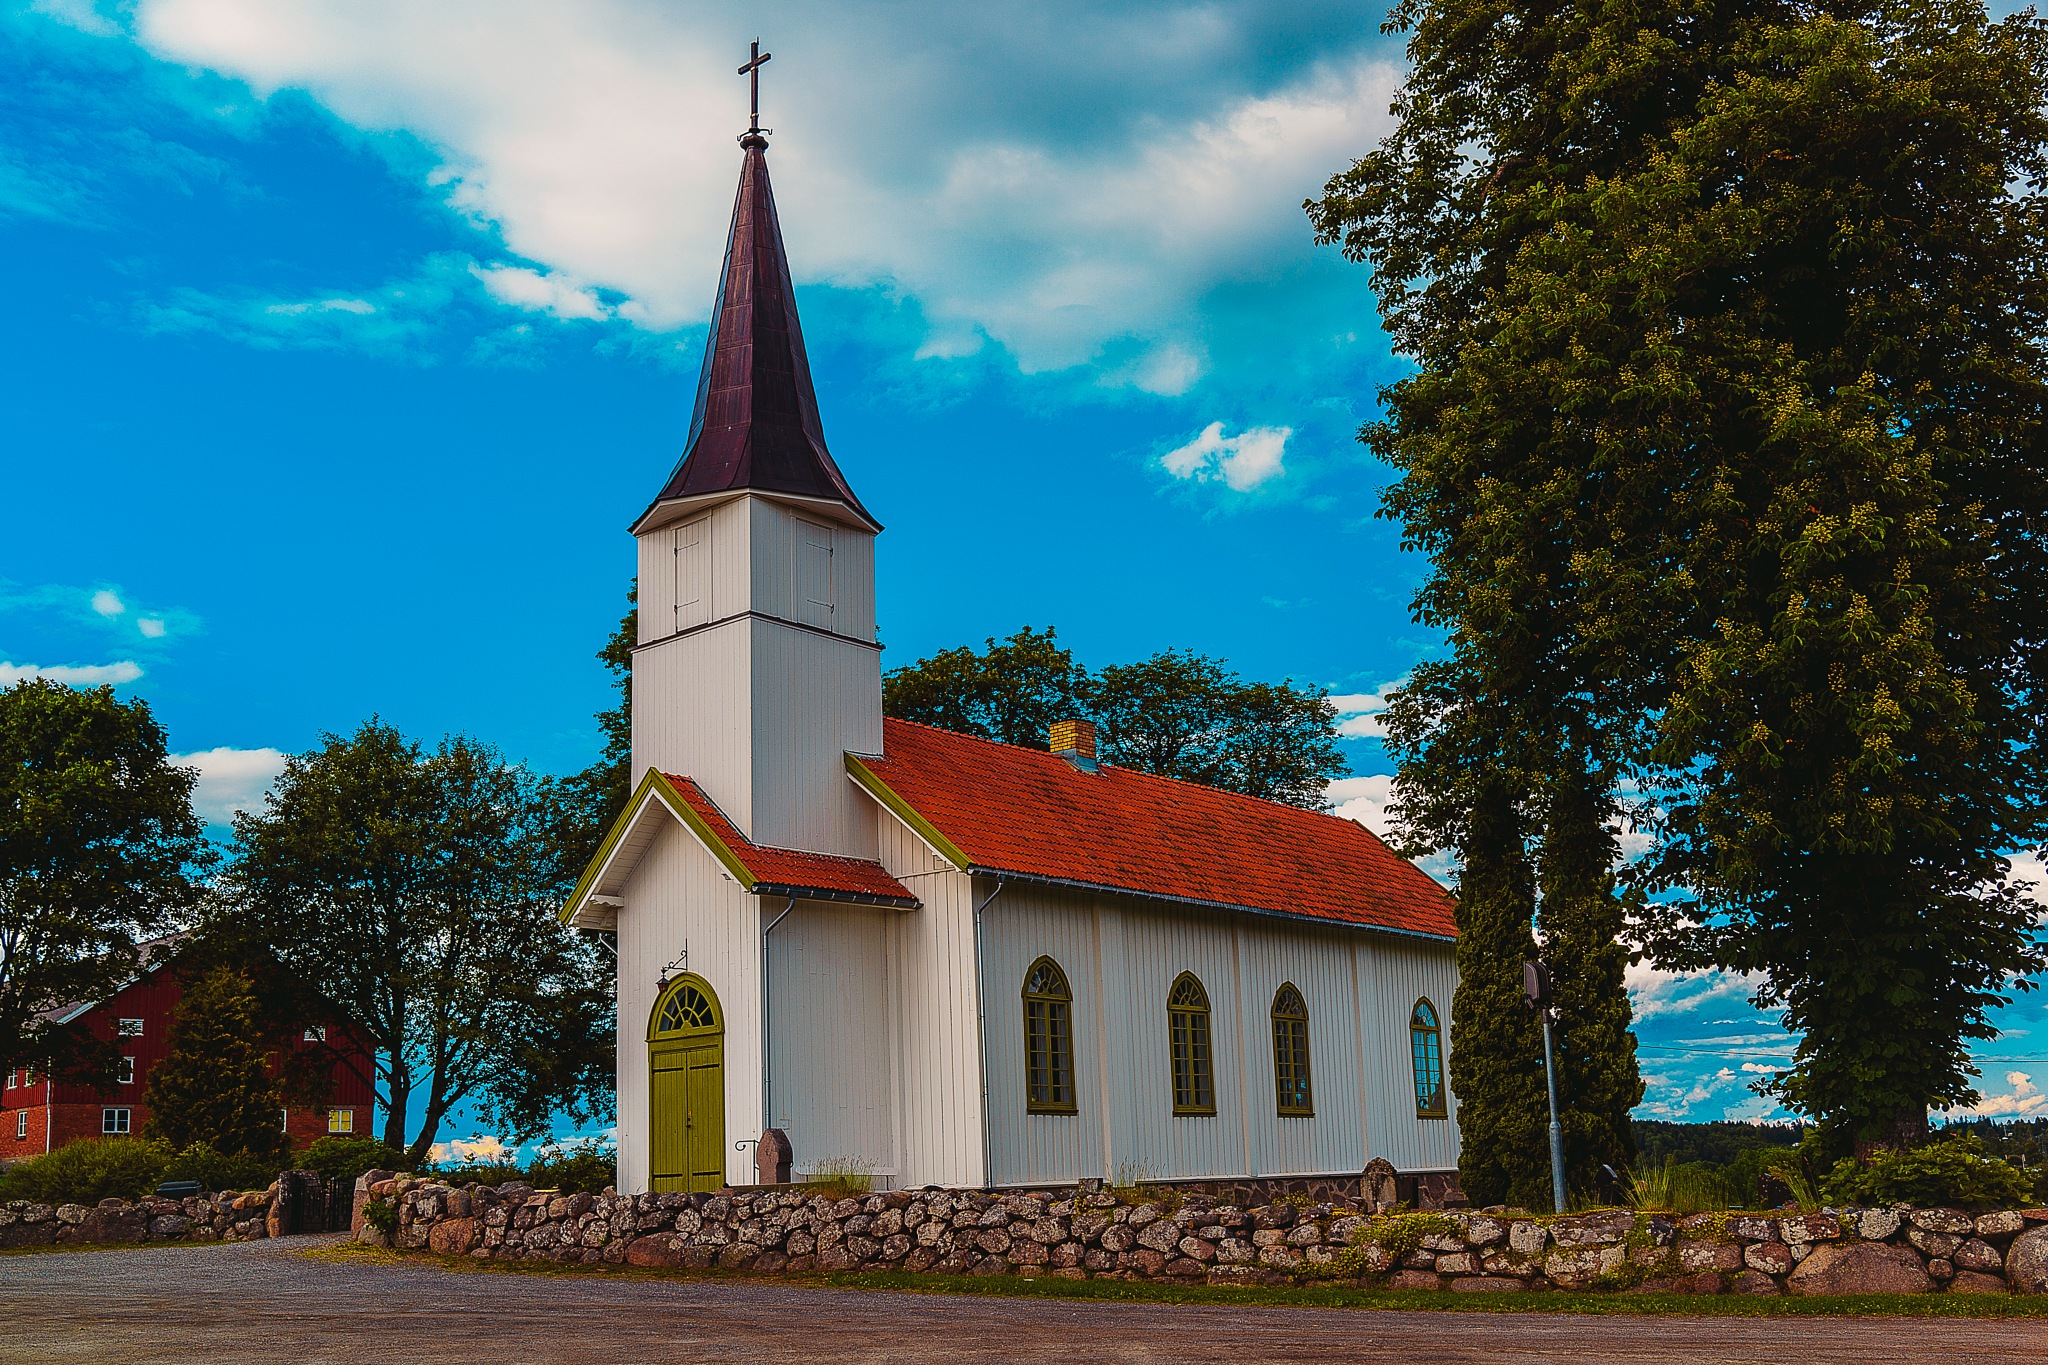 Norwegian Protestant Church by Goran Jorganovich